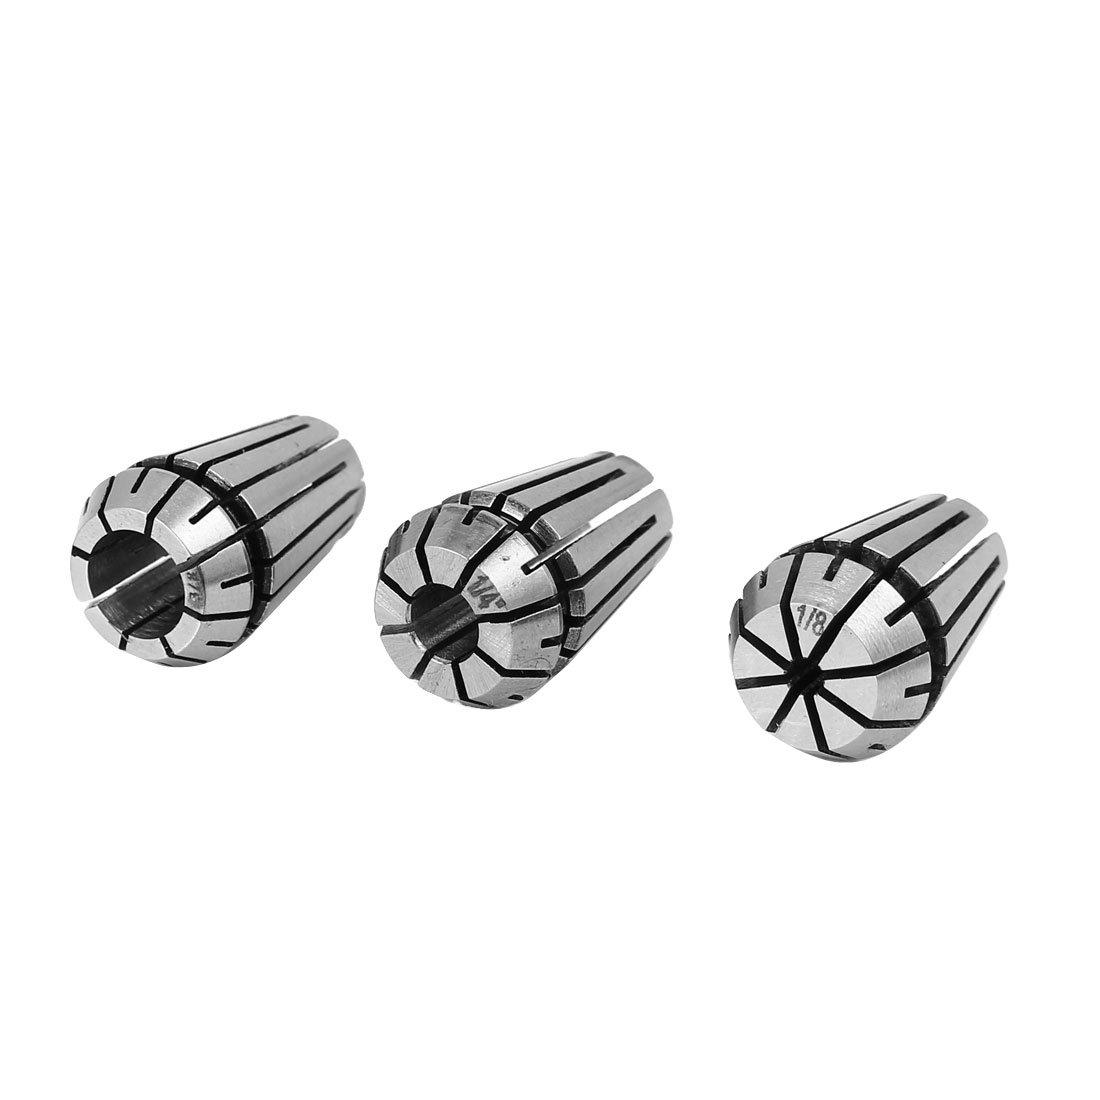 uxcell ER16 Lathe Milling Engraving Machine 65 Manganese Steel Spring Collet Set 3 in 1